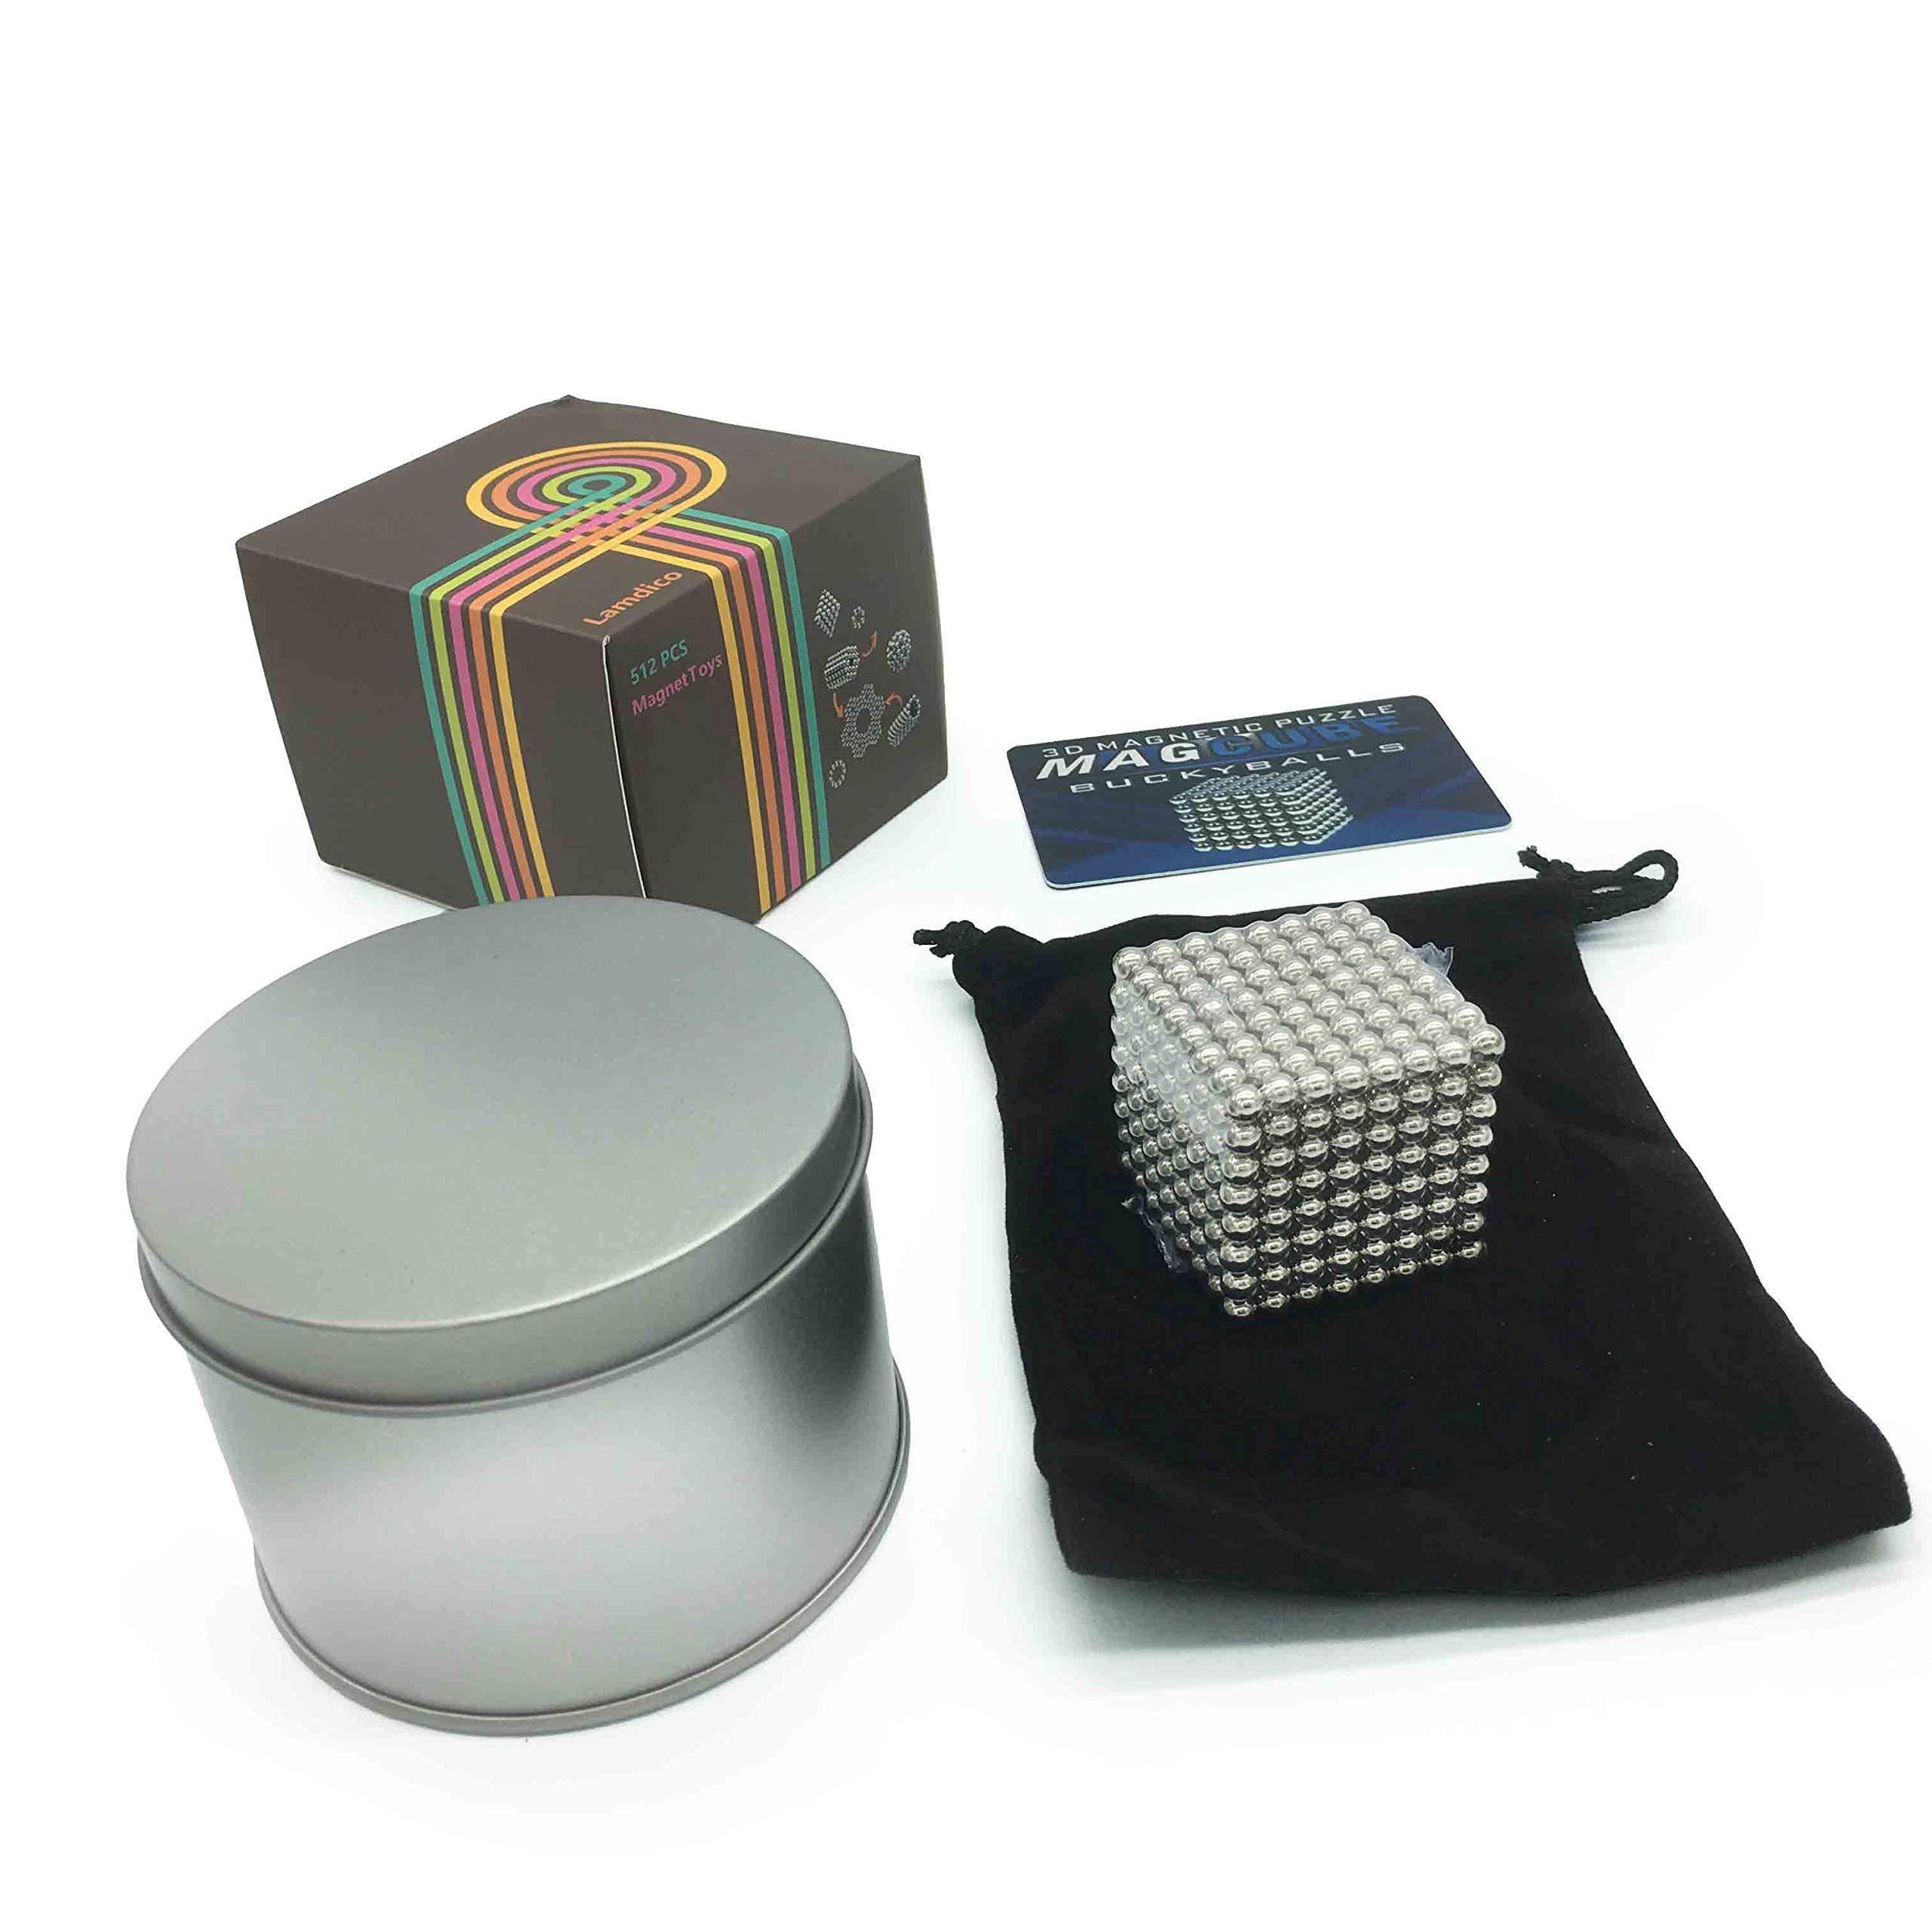 Lamdico Fidget Cube 512 Pcs,Desk Cube for Stress Relief & Creative Inspiration Include Splitter Card and Storage Bag by Lamdico (Image #3)